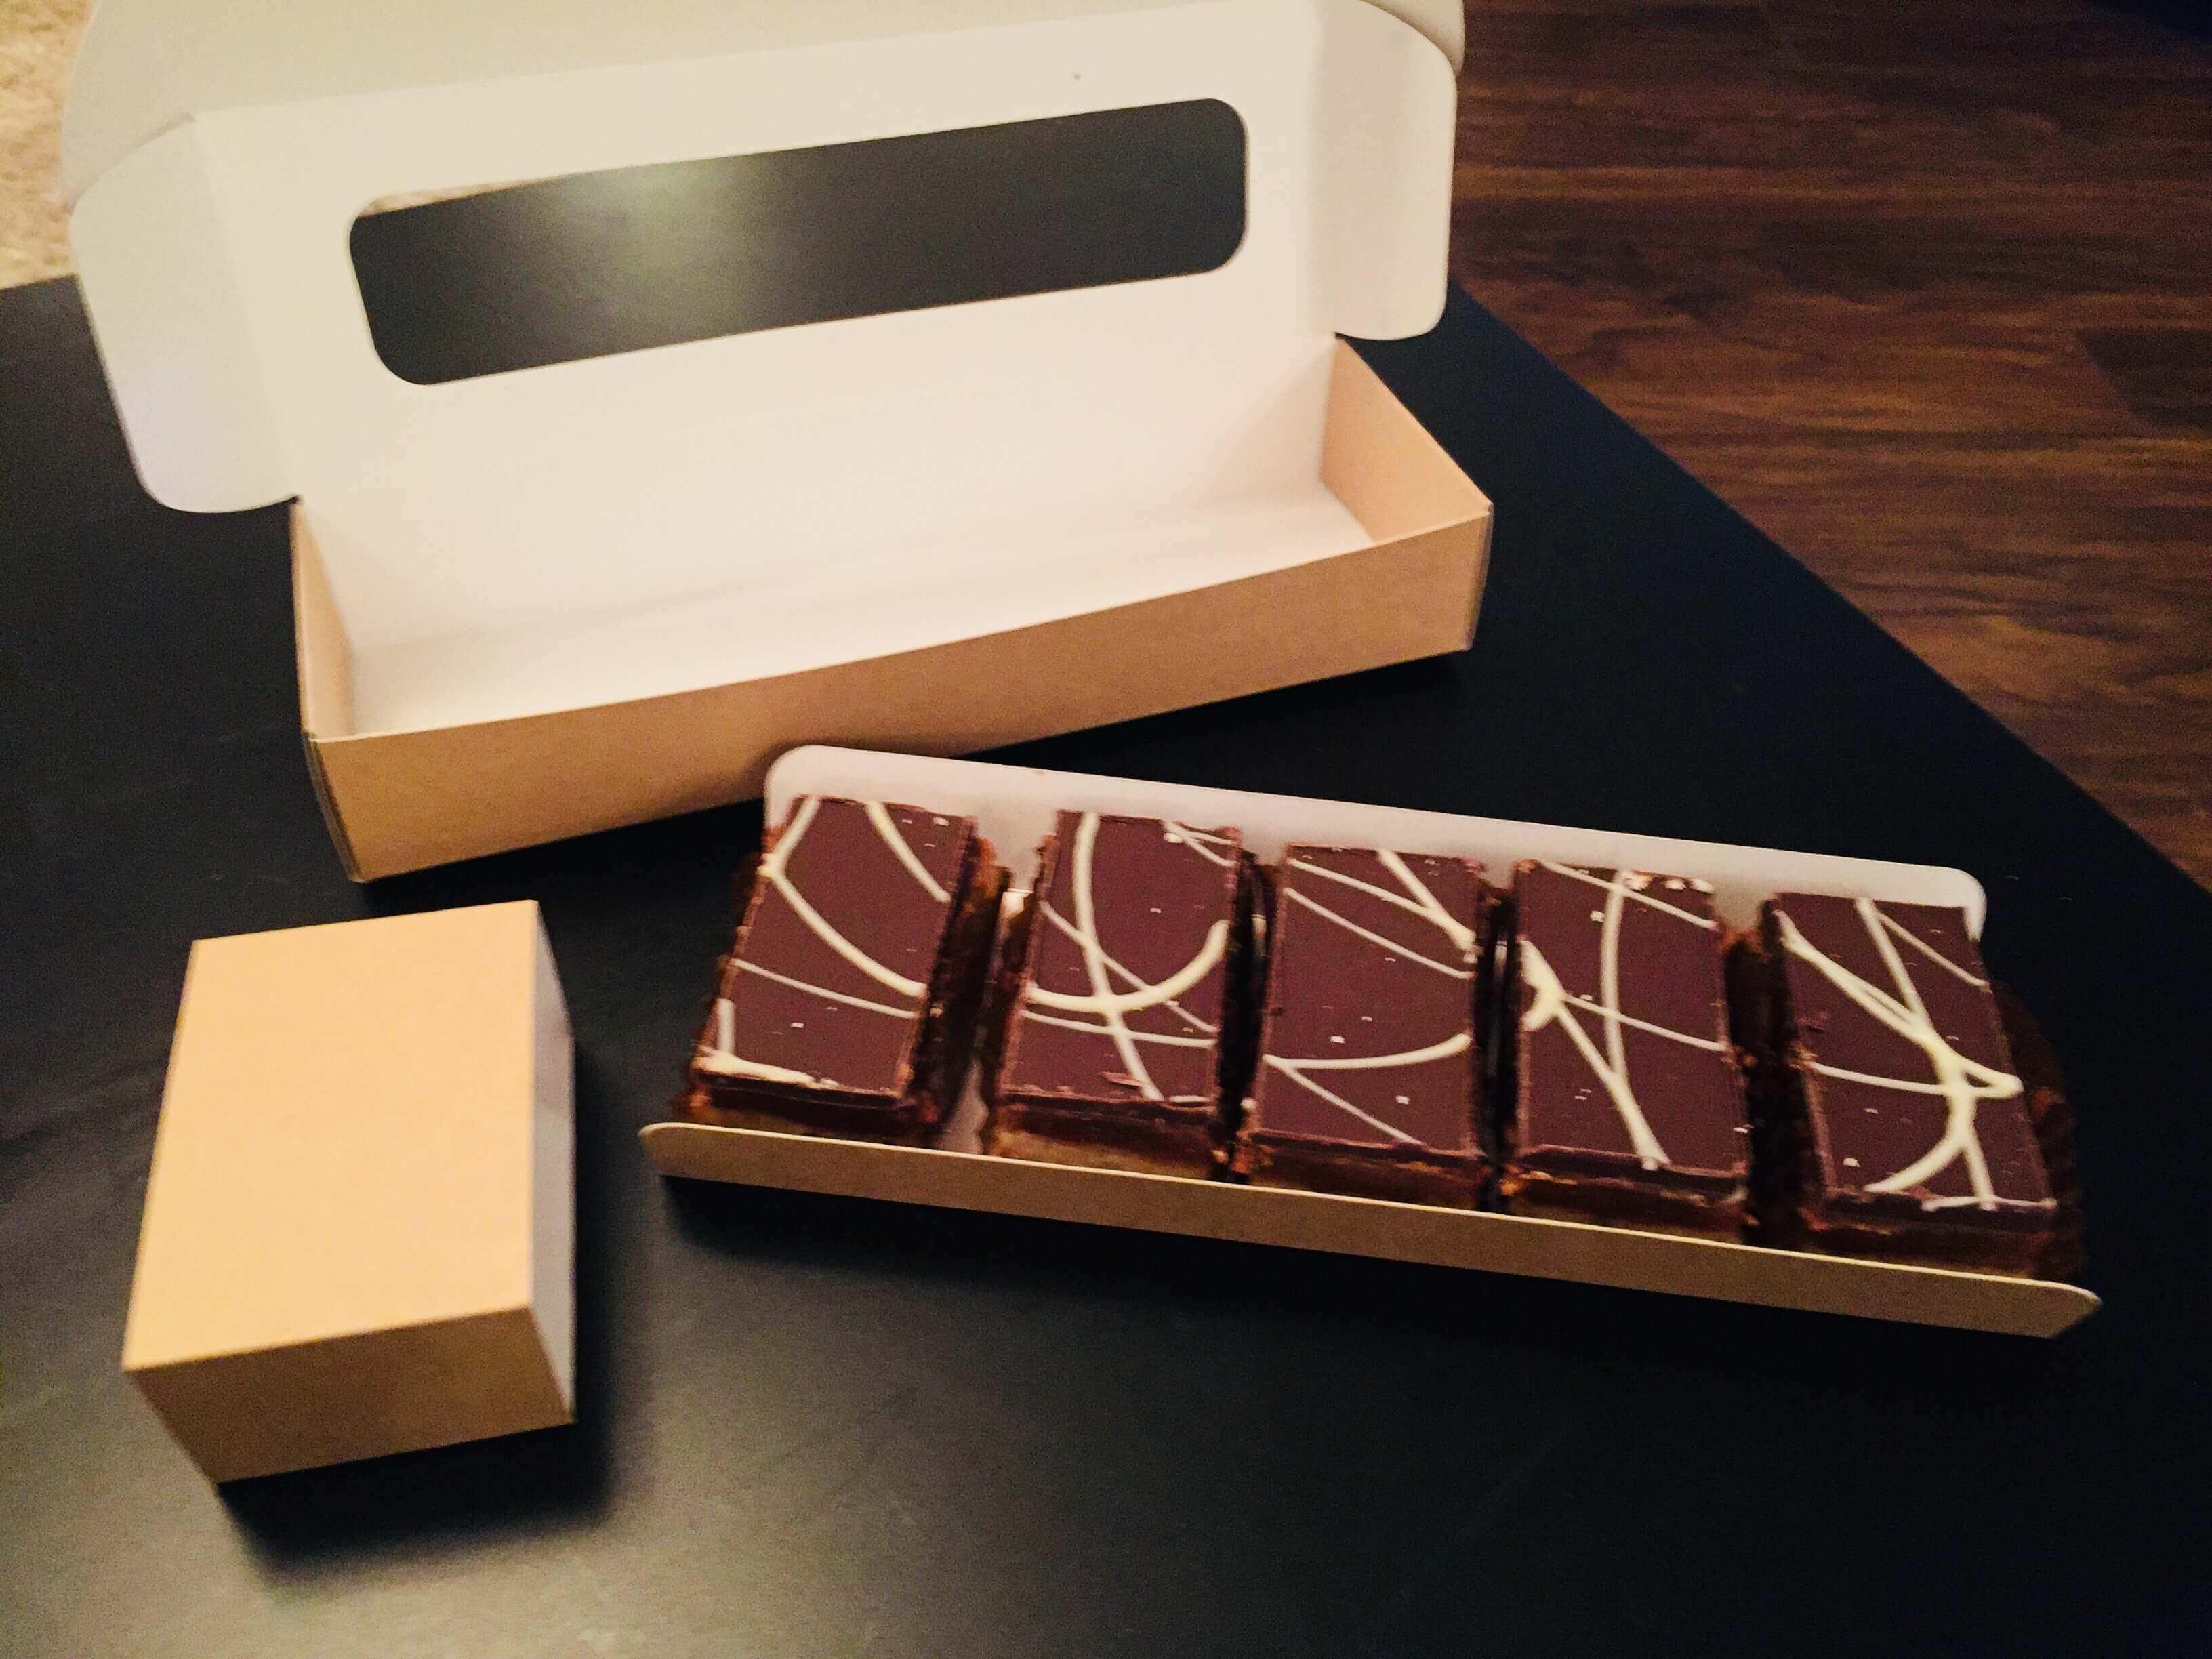 Tray Bake Hinge Lid Box with U Card & Sleeve